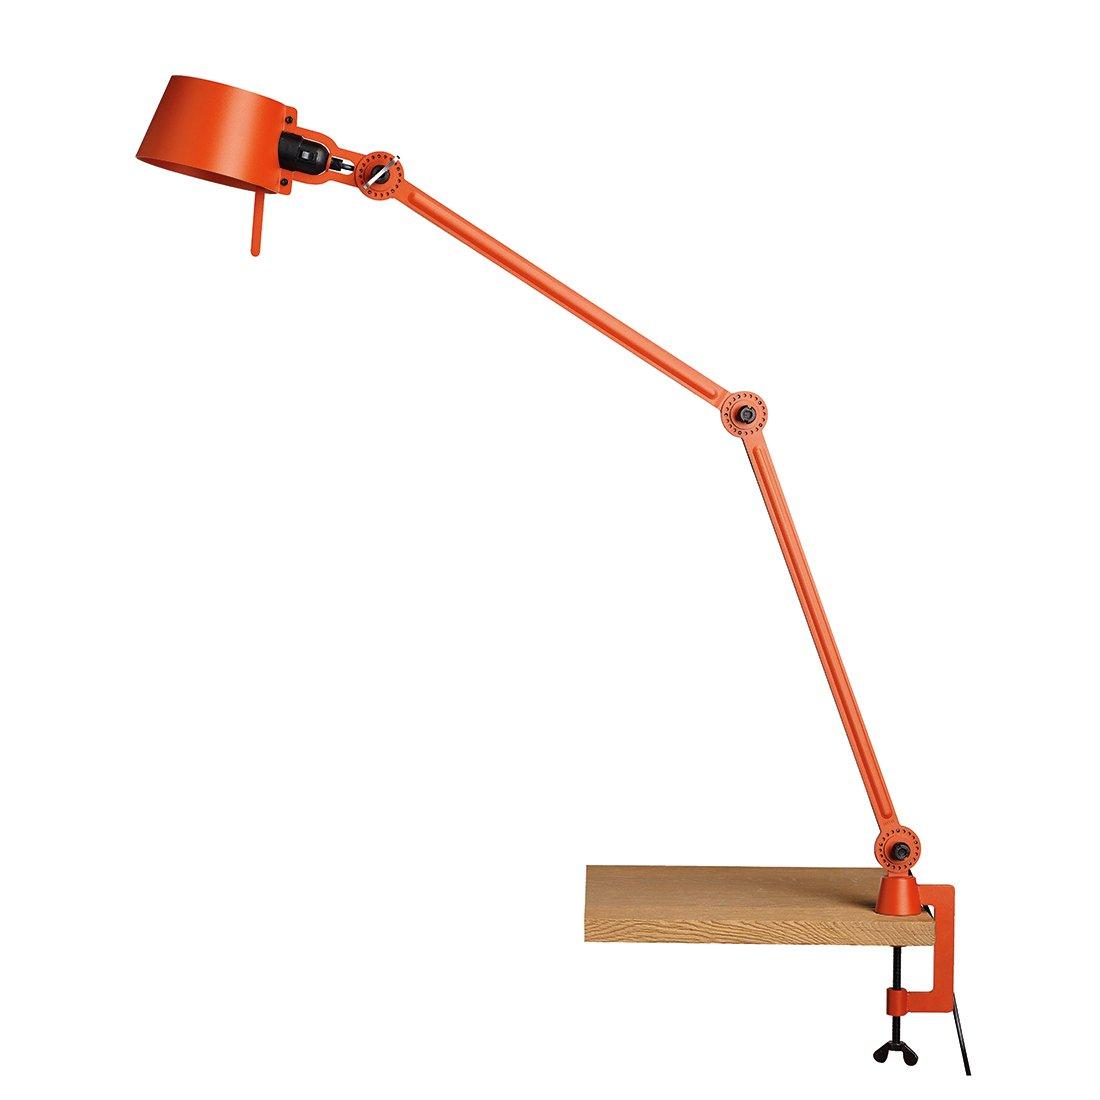 Tonone Bolt Bureaulamp Twee Armen Met Klem Striking Orange